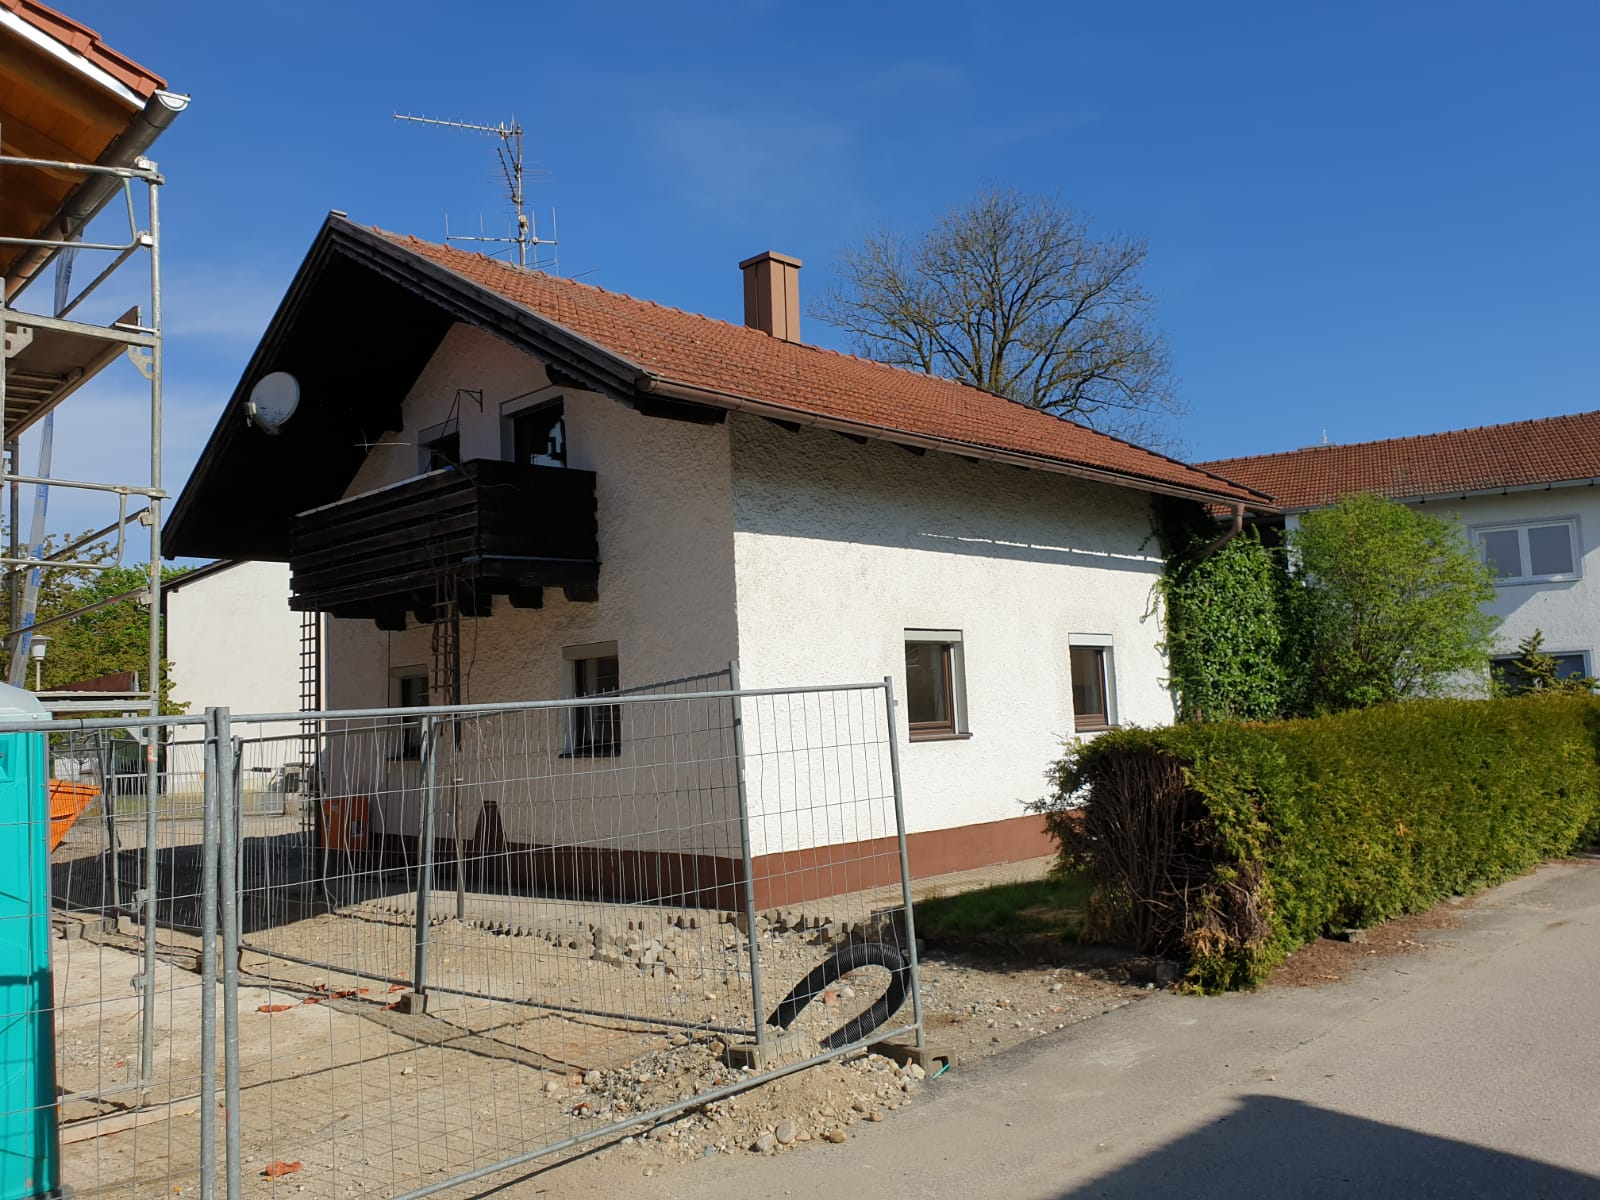 Bezahlbares EFH mit 327 m² Grundstück in 84513 Töging, nähe Autobahnanbindung A94 München